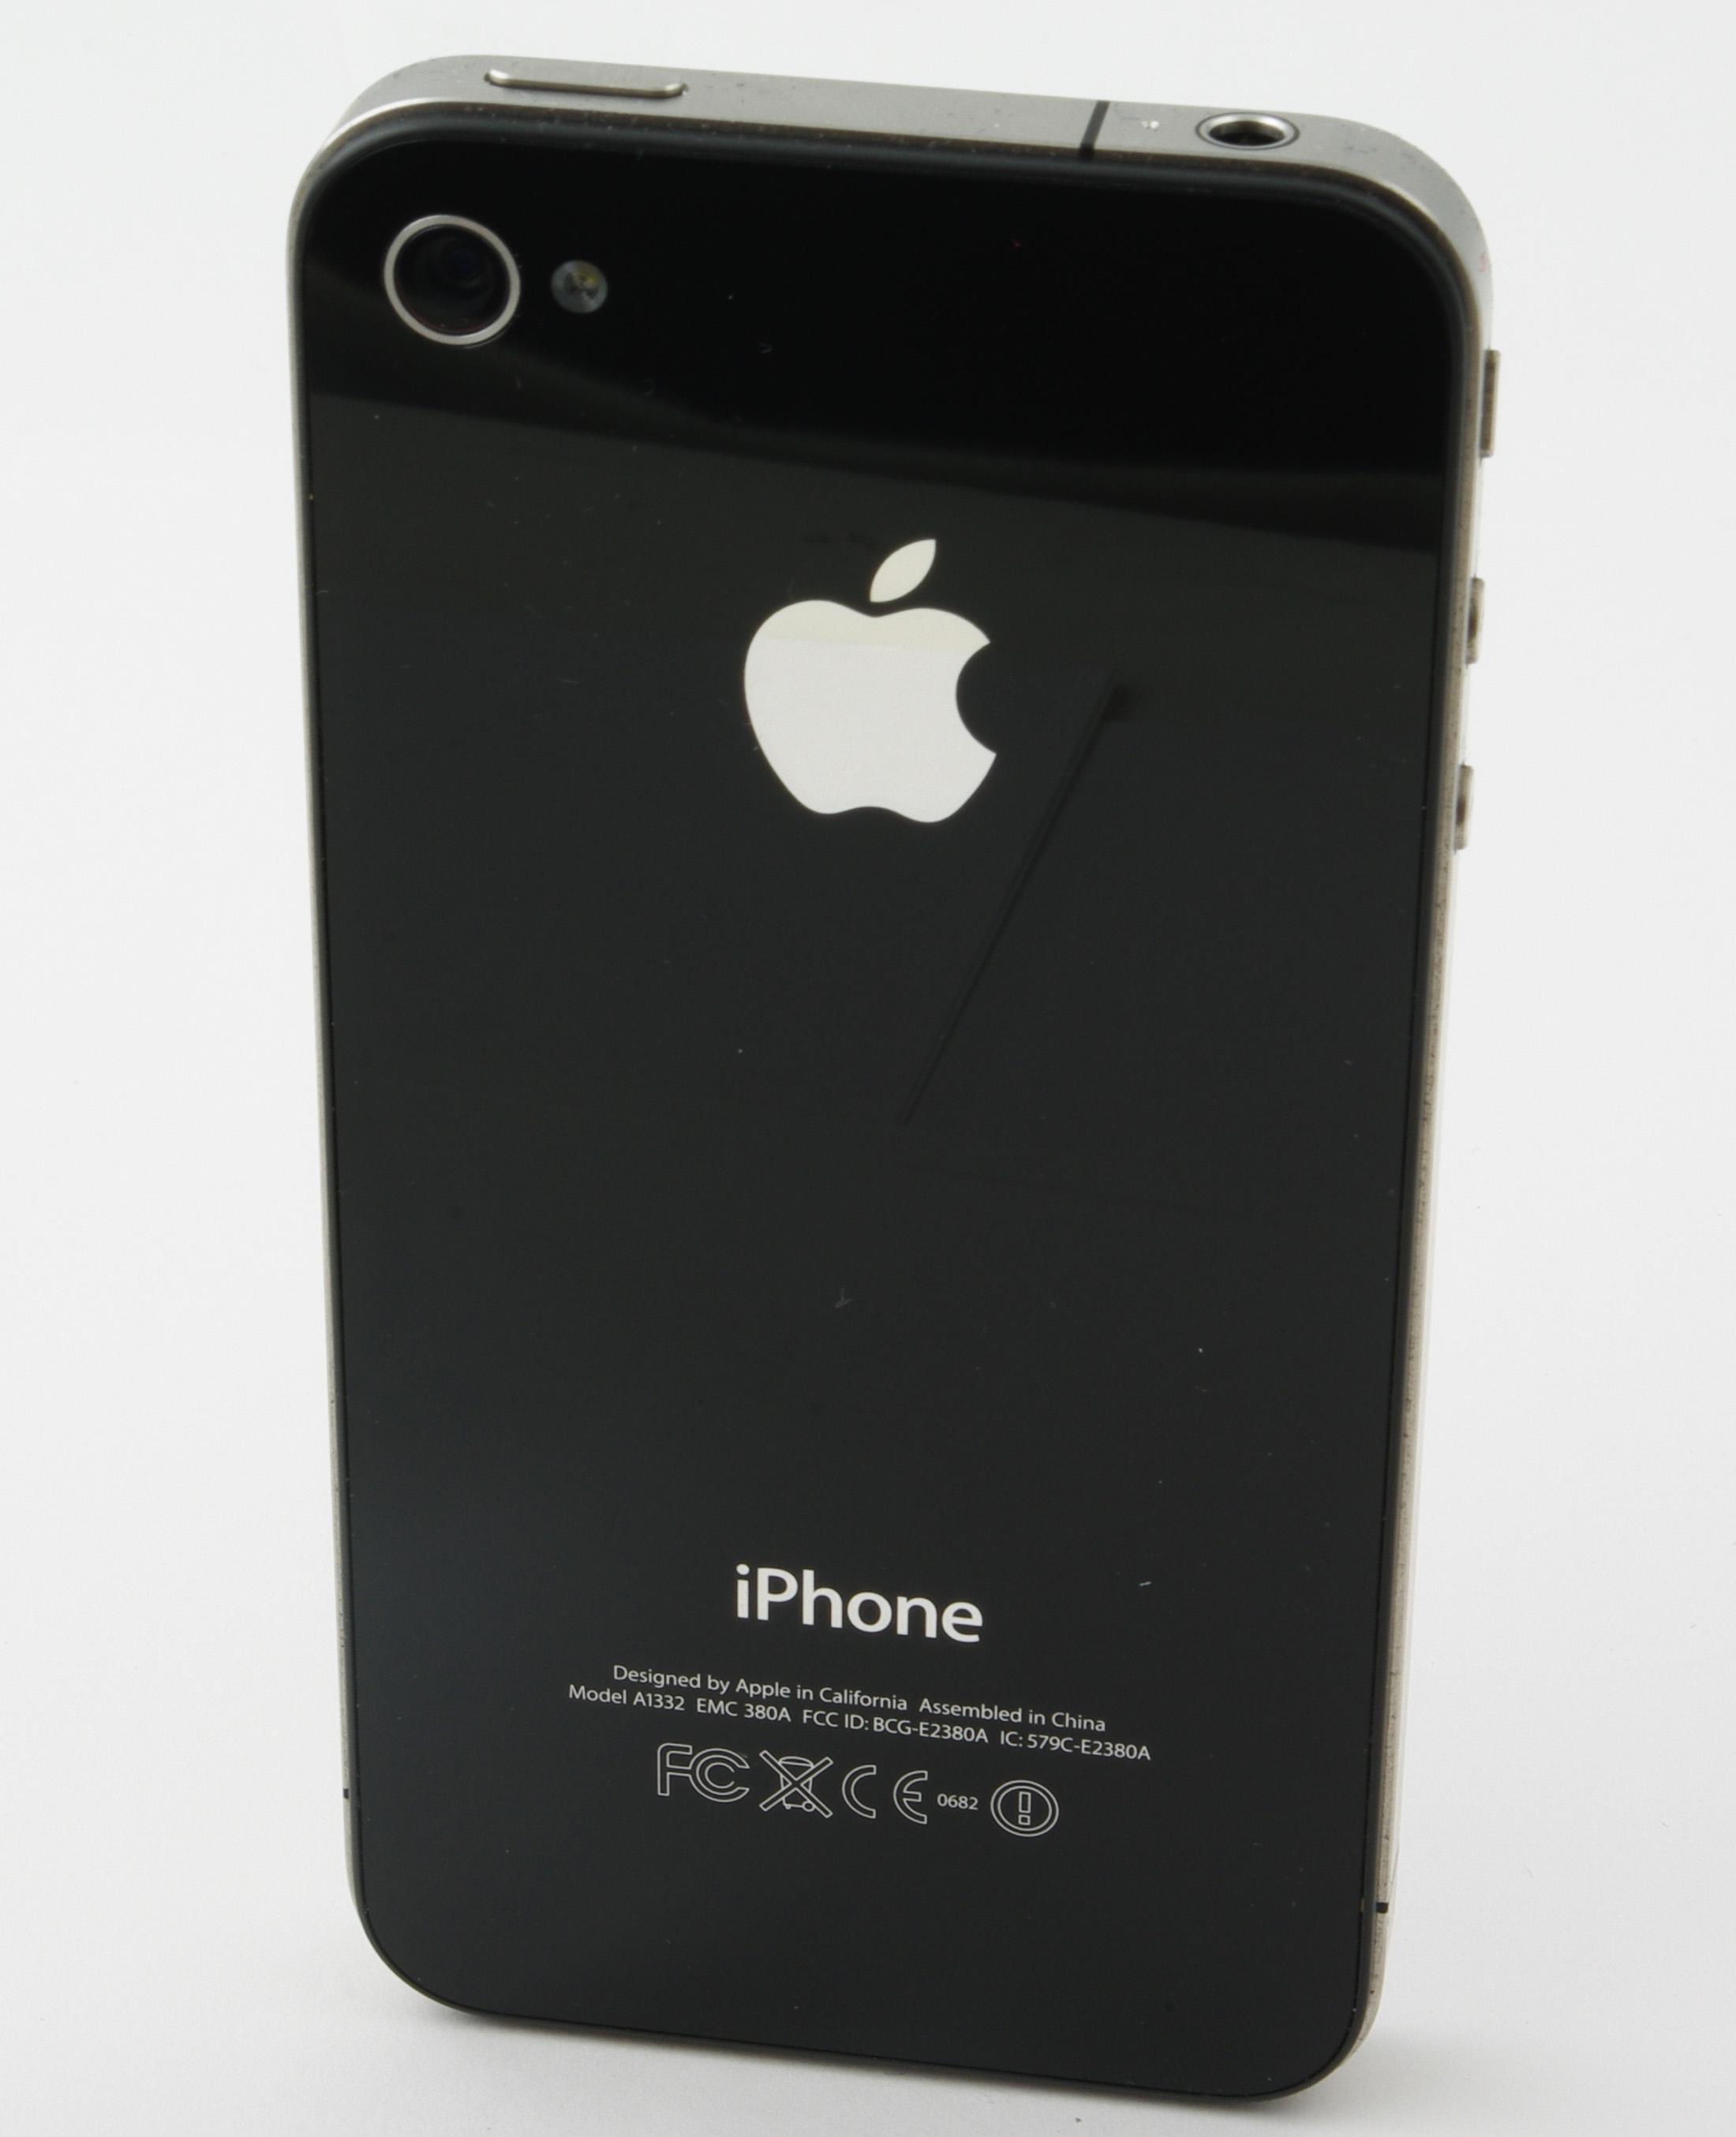 Apple iPhone, sE skladem u od 7 777 Iphone, se, akce i phone za neskutenou cenu